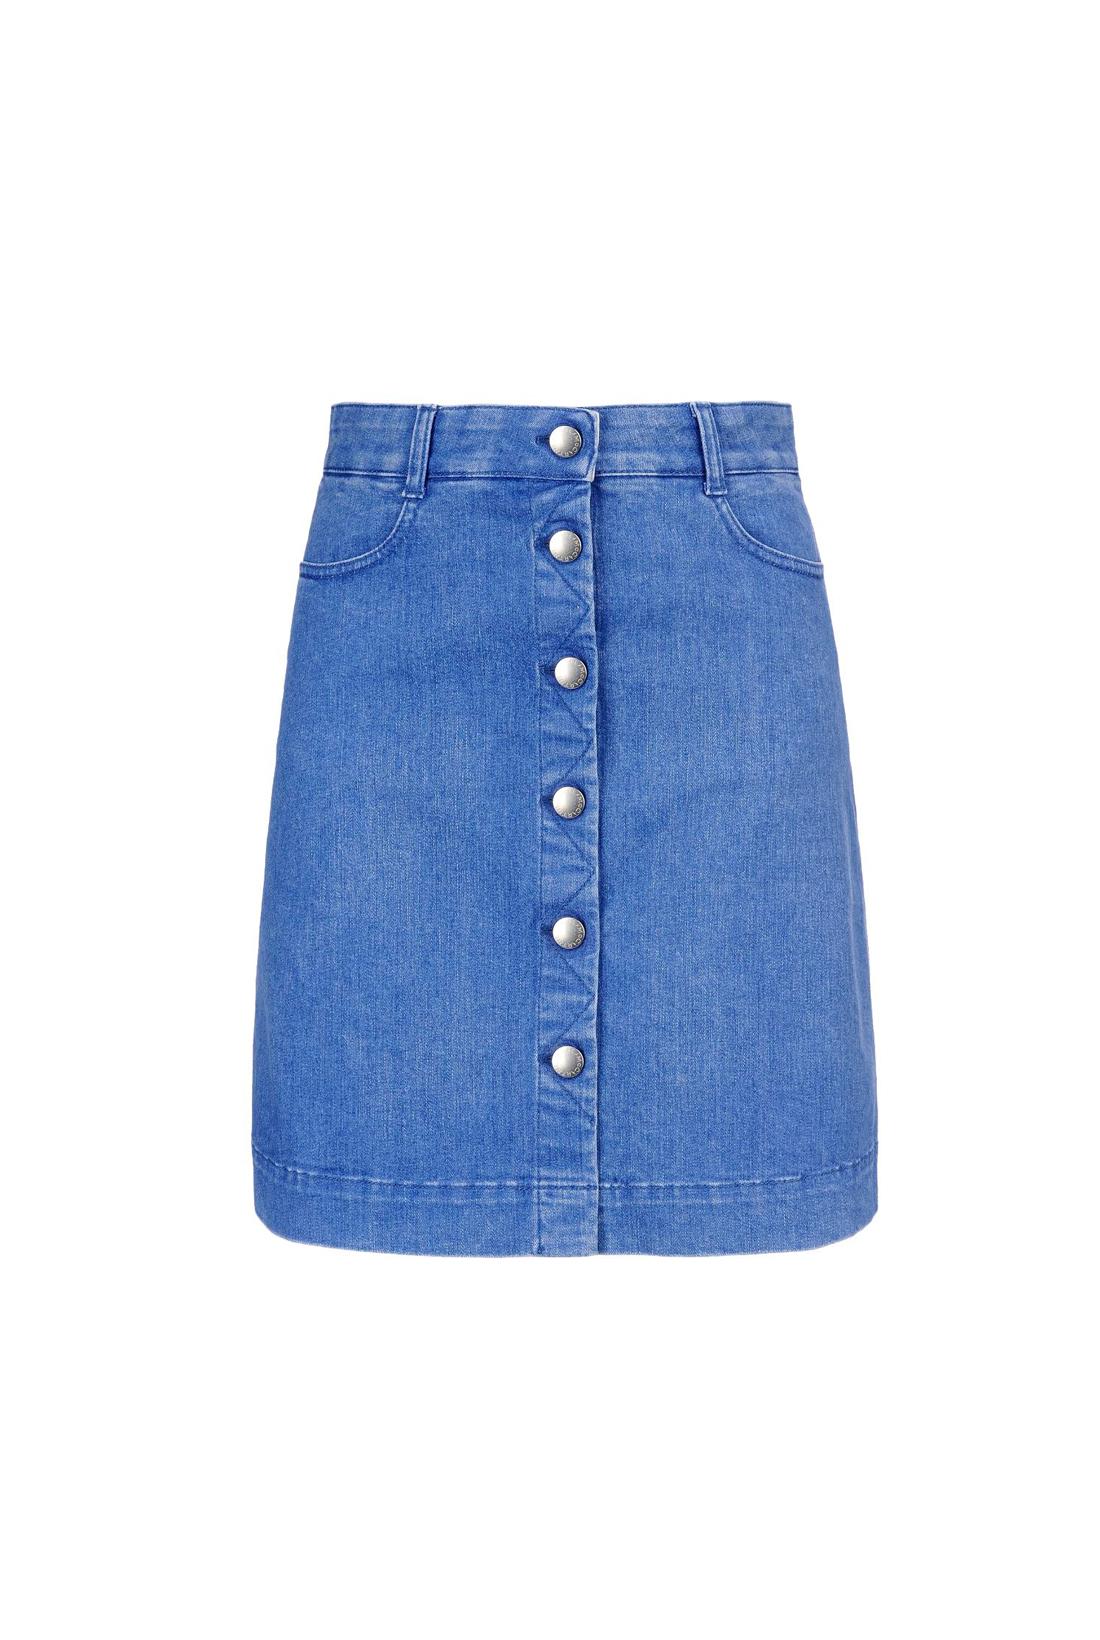 11-spring-denim-trends-button-down-skirt-04.jpg